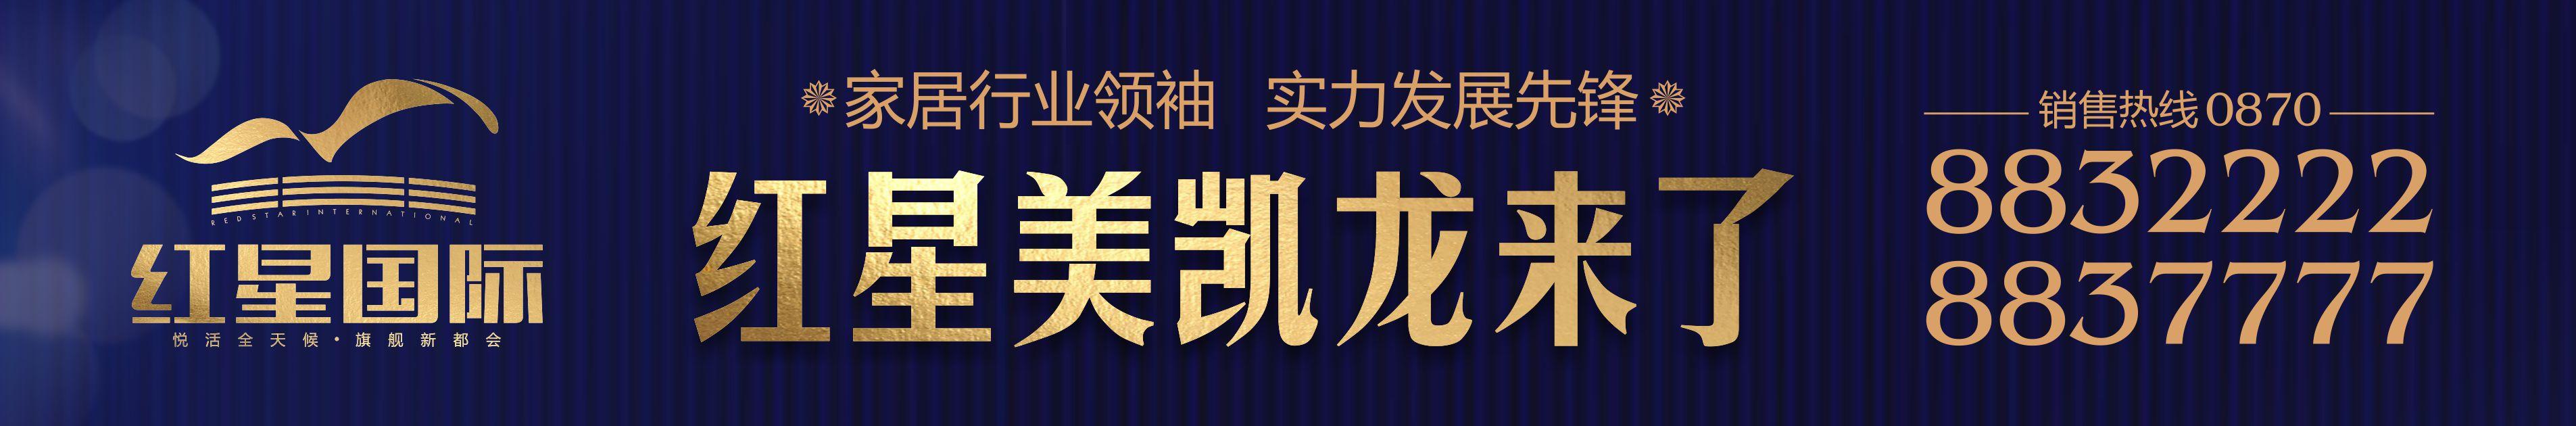 http://www.657200.cn/post/xinloupan/2060